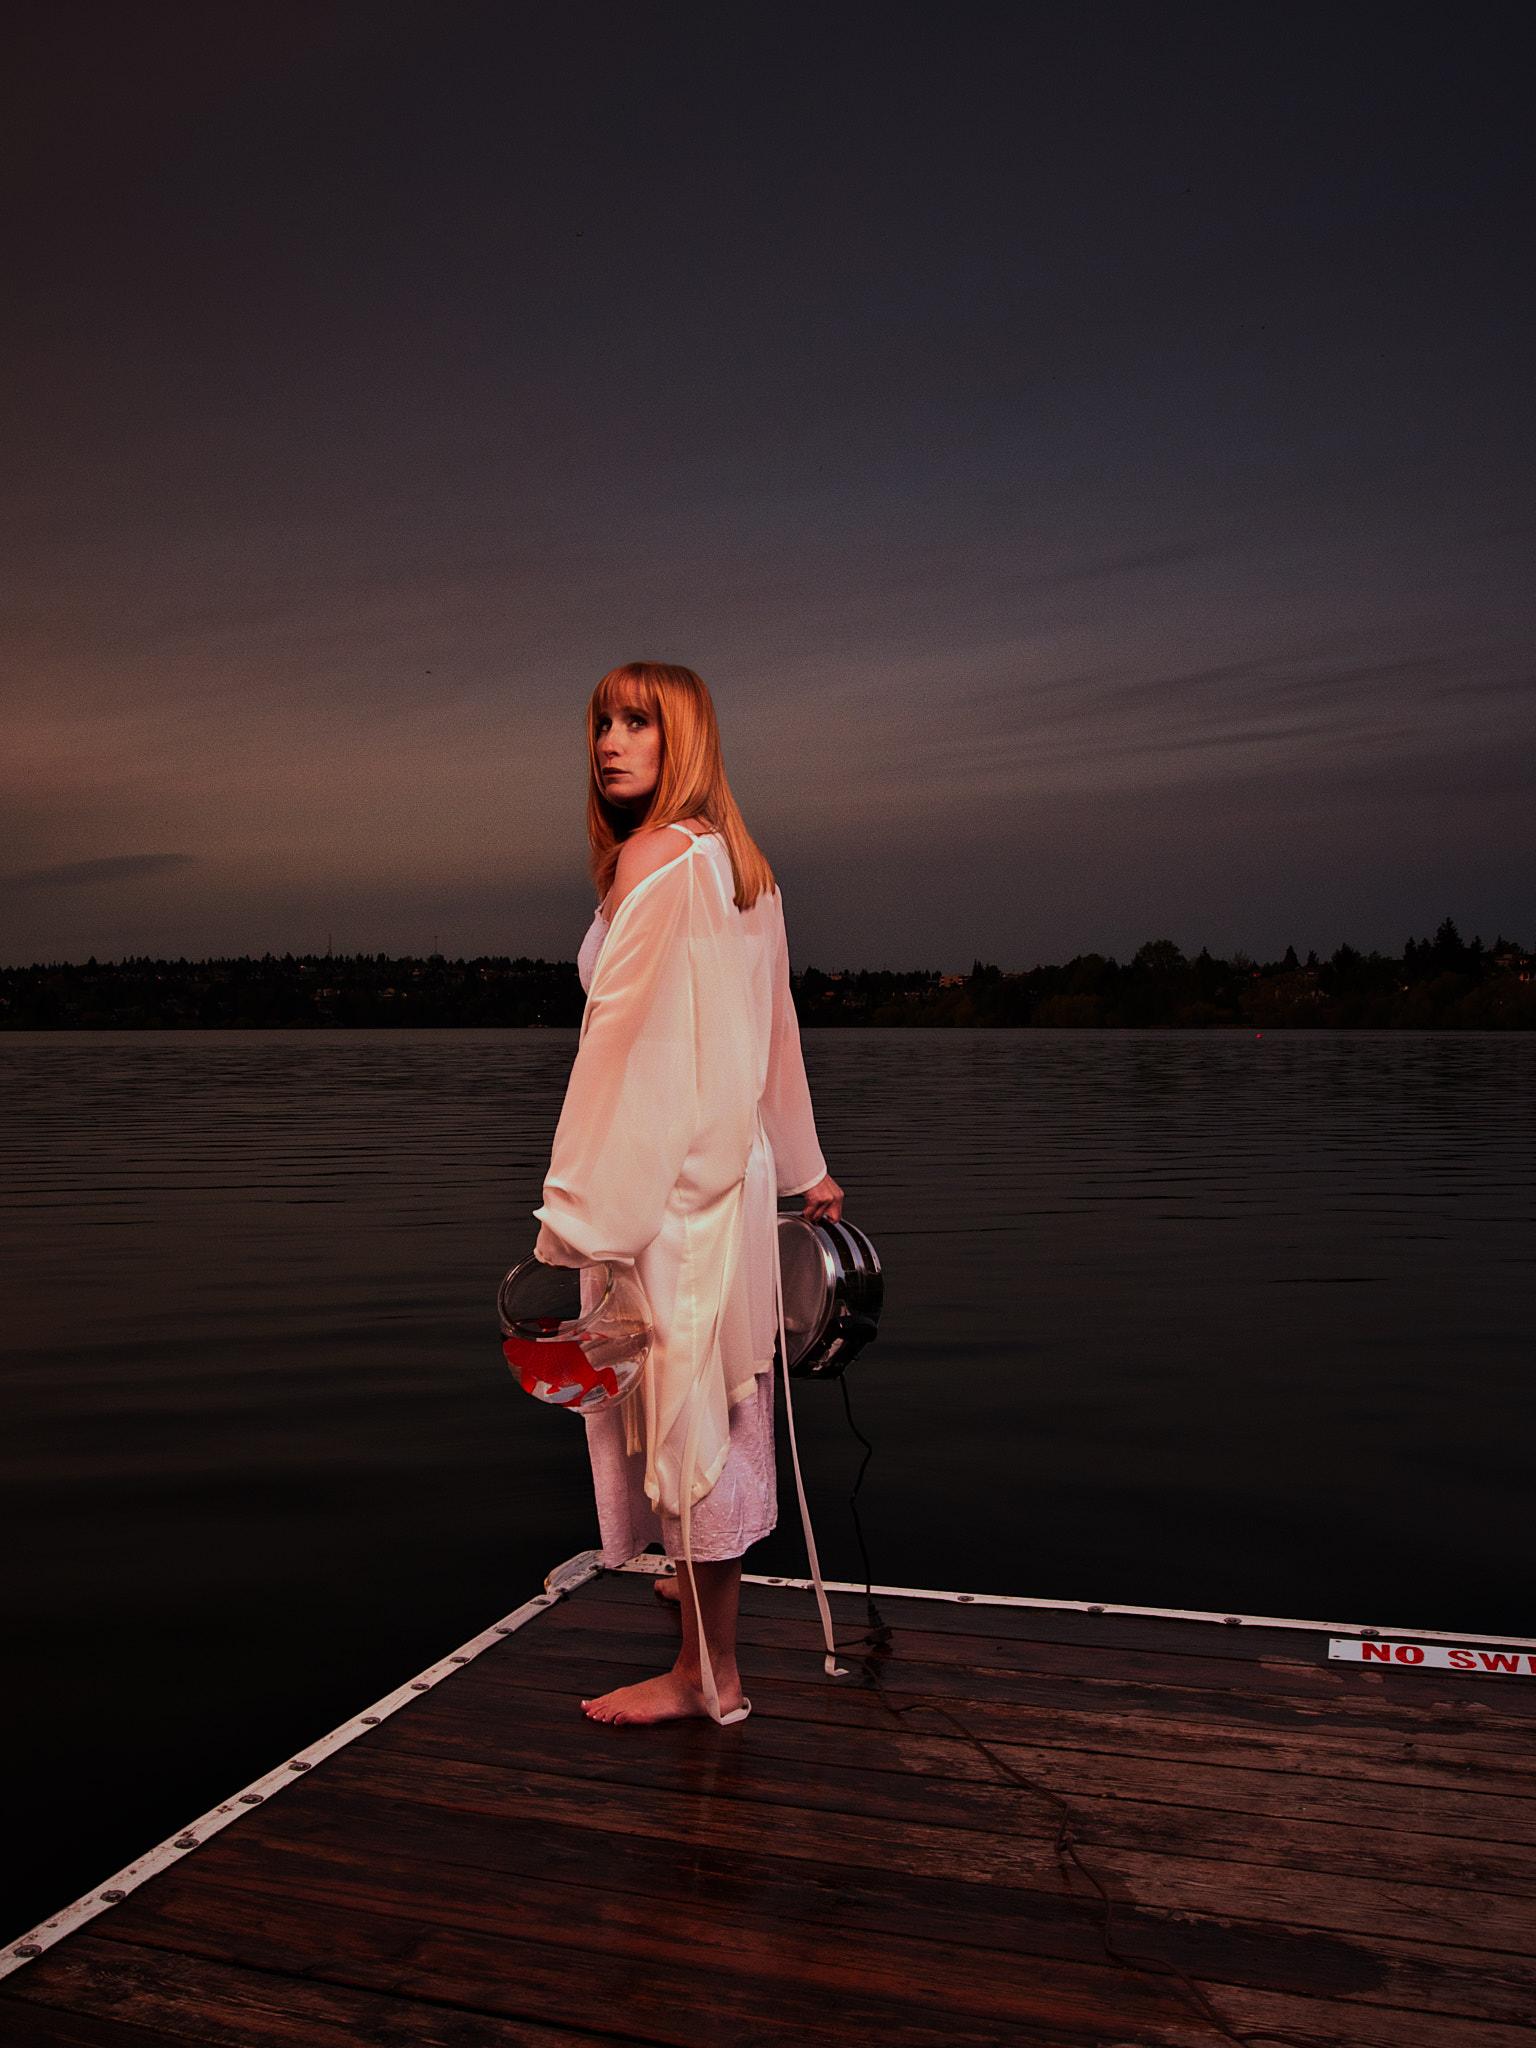 Dana Sue w Toaster on Lake.jpg